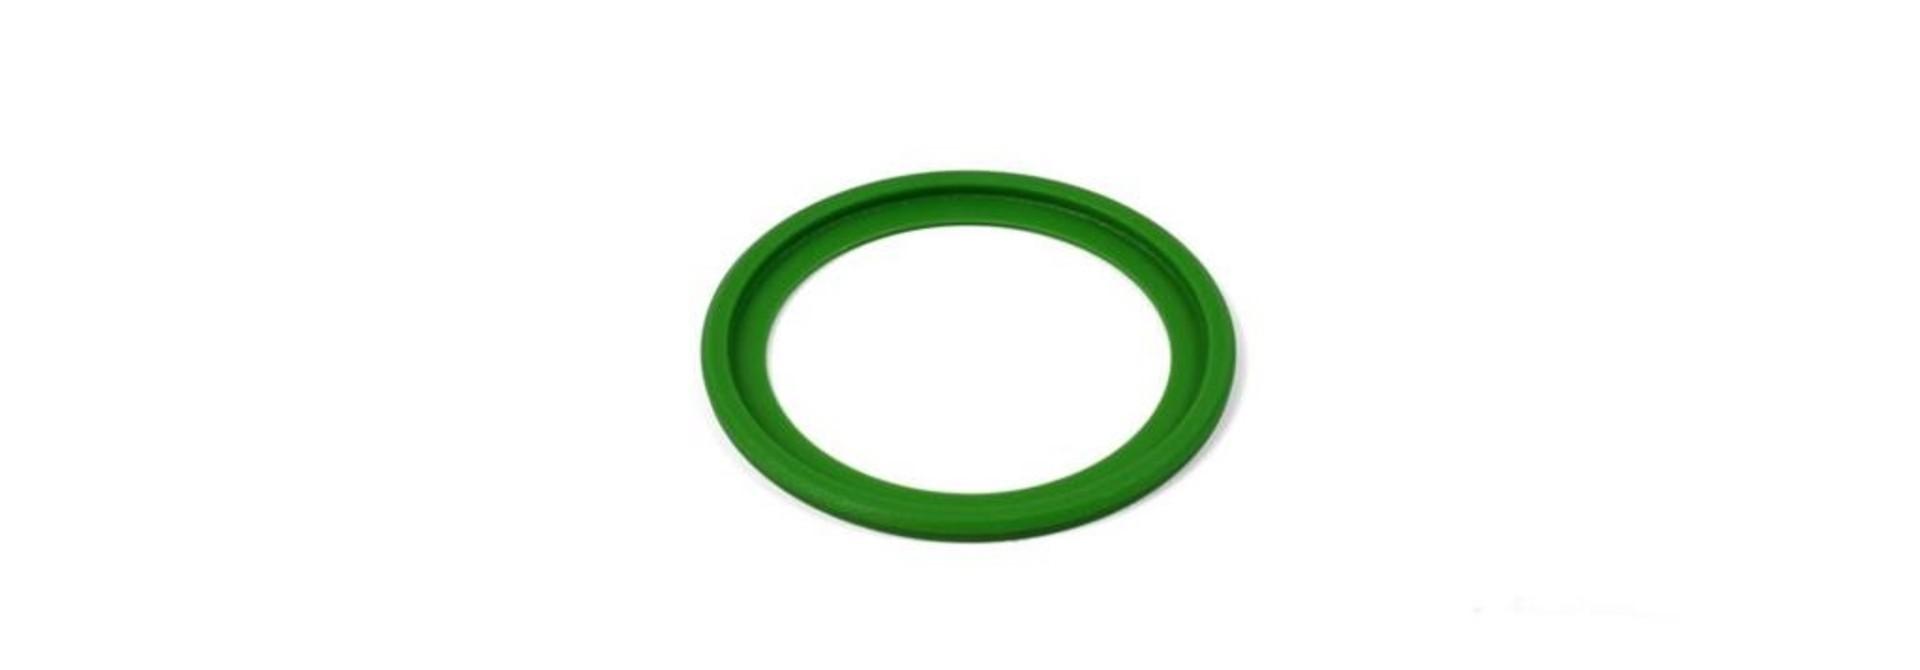 Hope Pro 4 Hub Seal Green